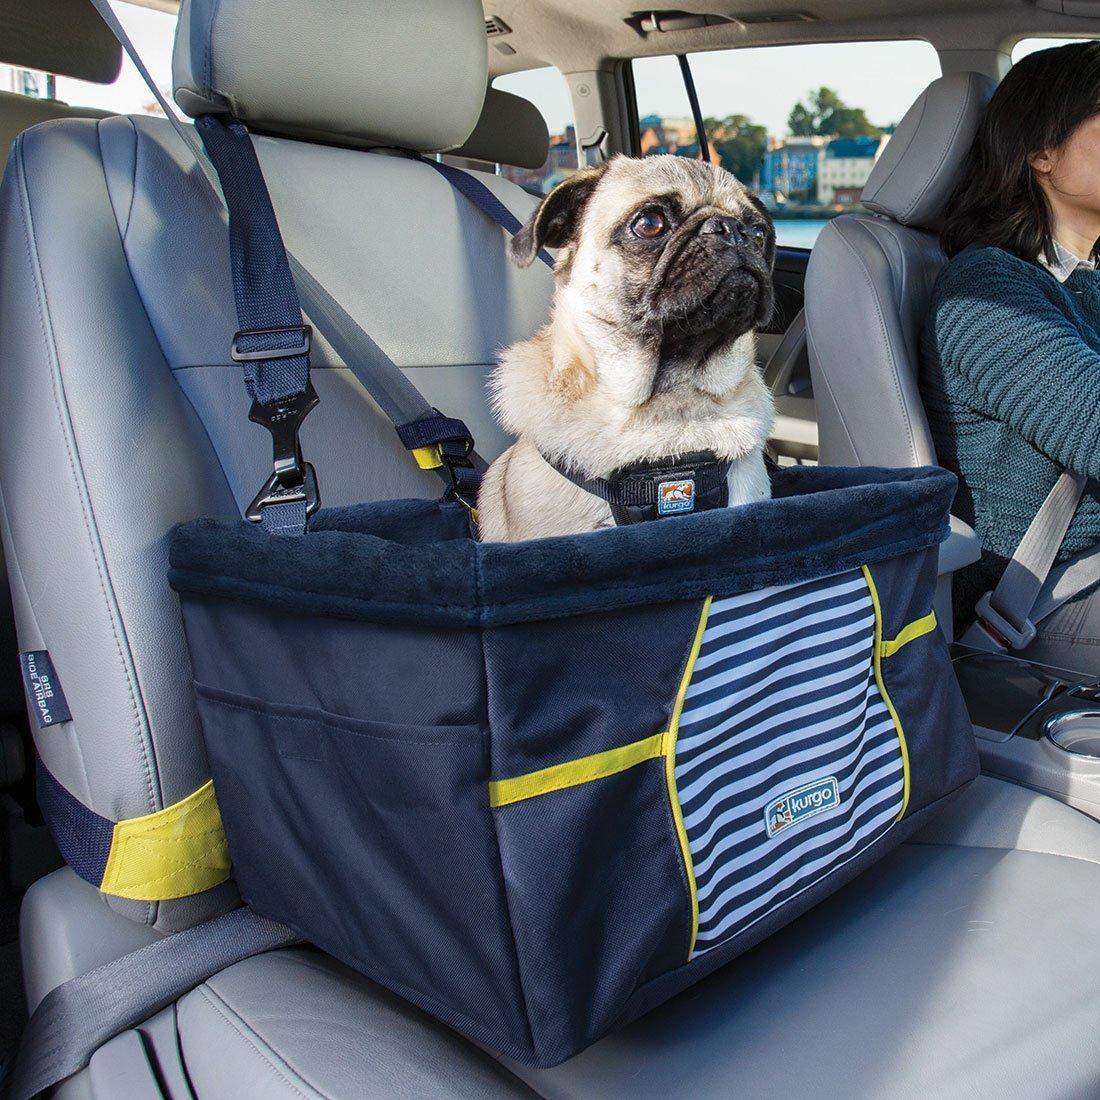 Kurgo Nantucket Dog Booster Seat for Cars, Dog Car Seat, Pet Booster Seat – Comes with Seat Belt Tether, Navy Blue